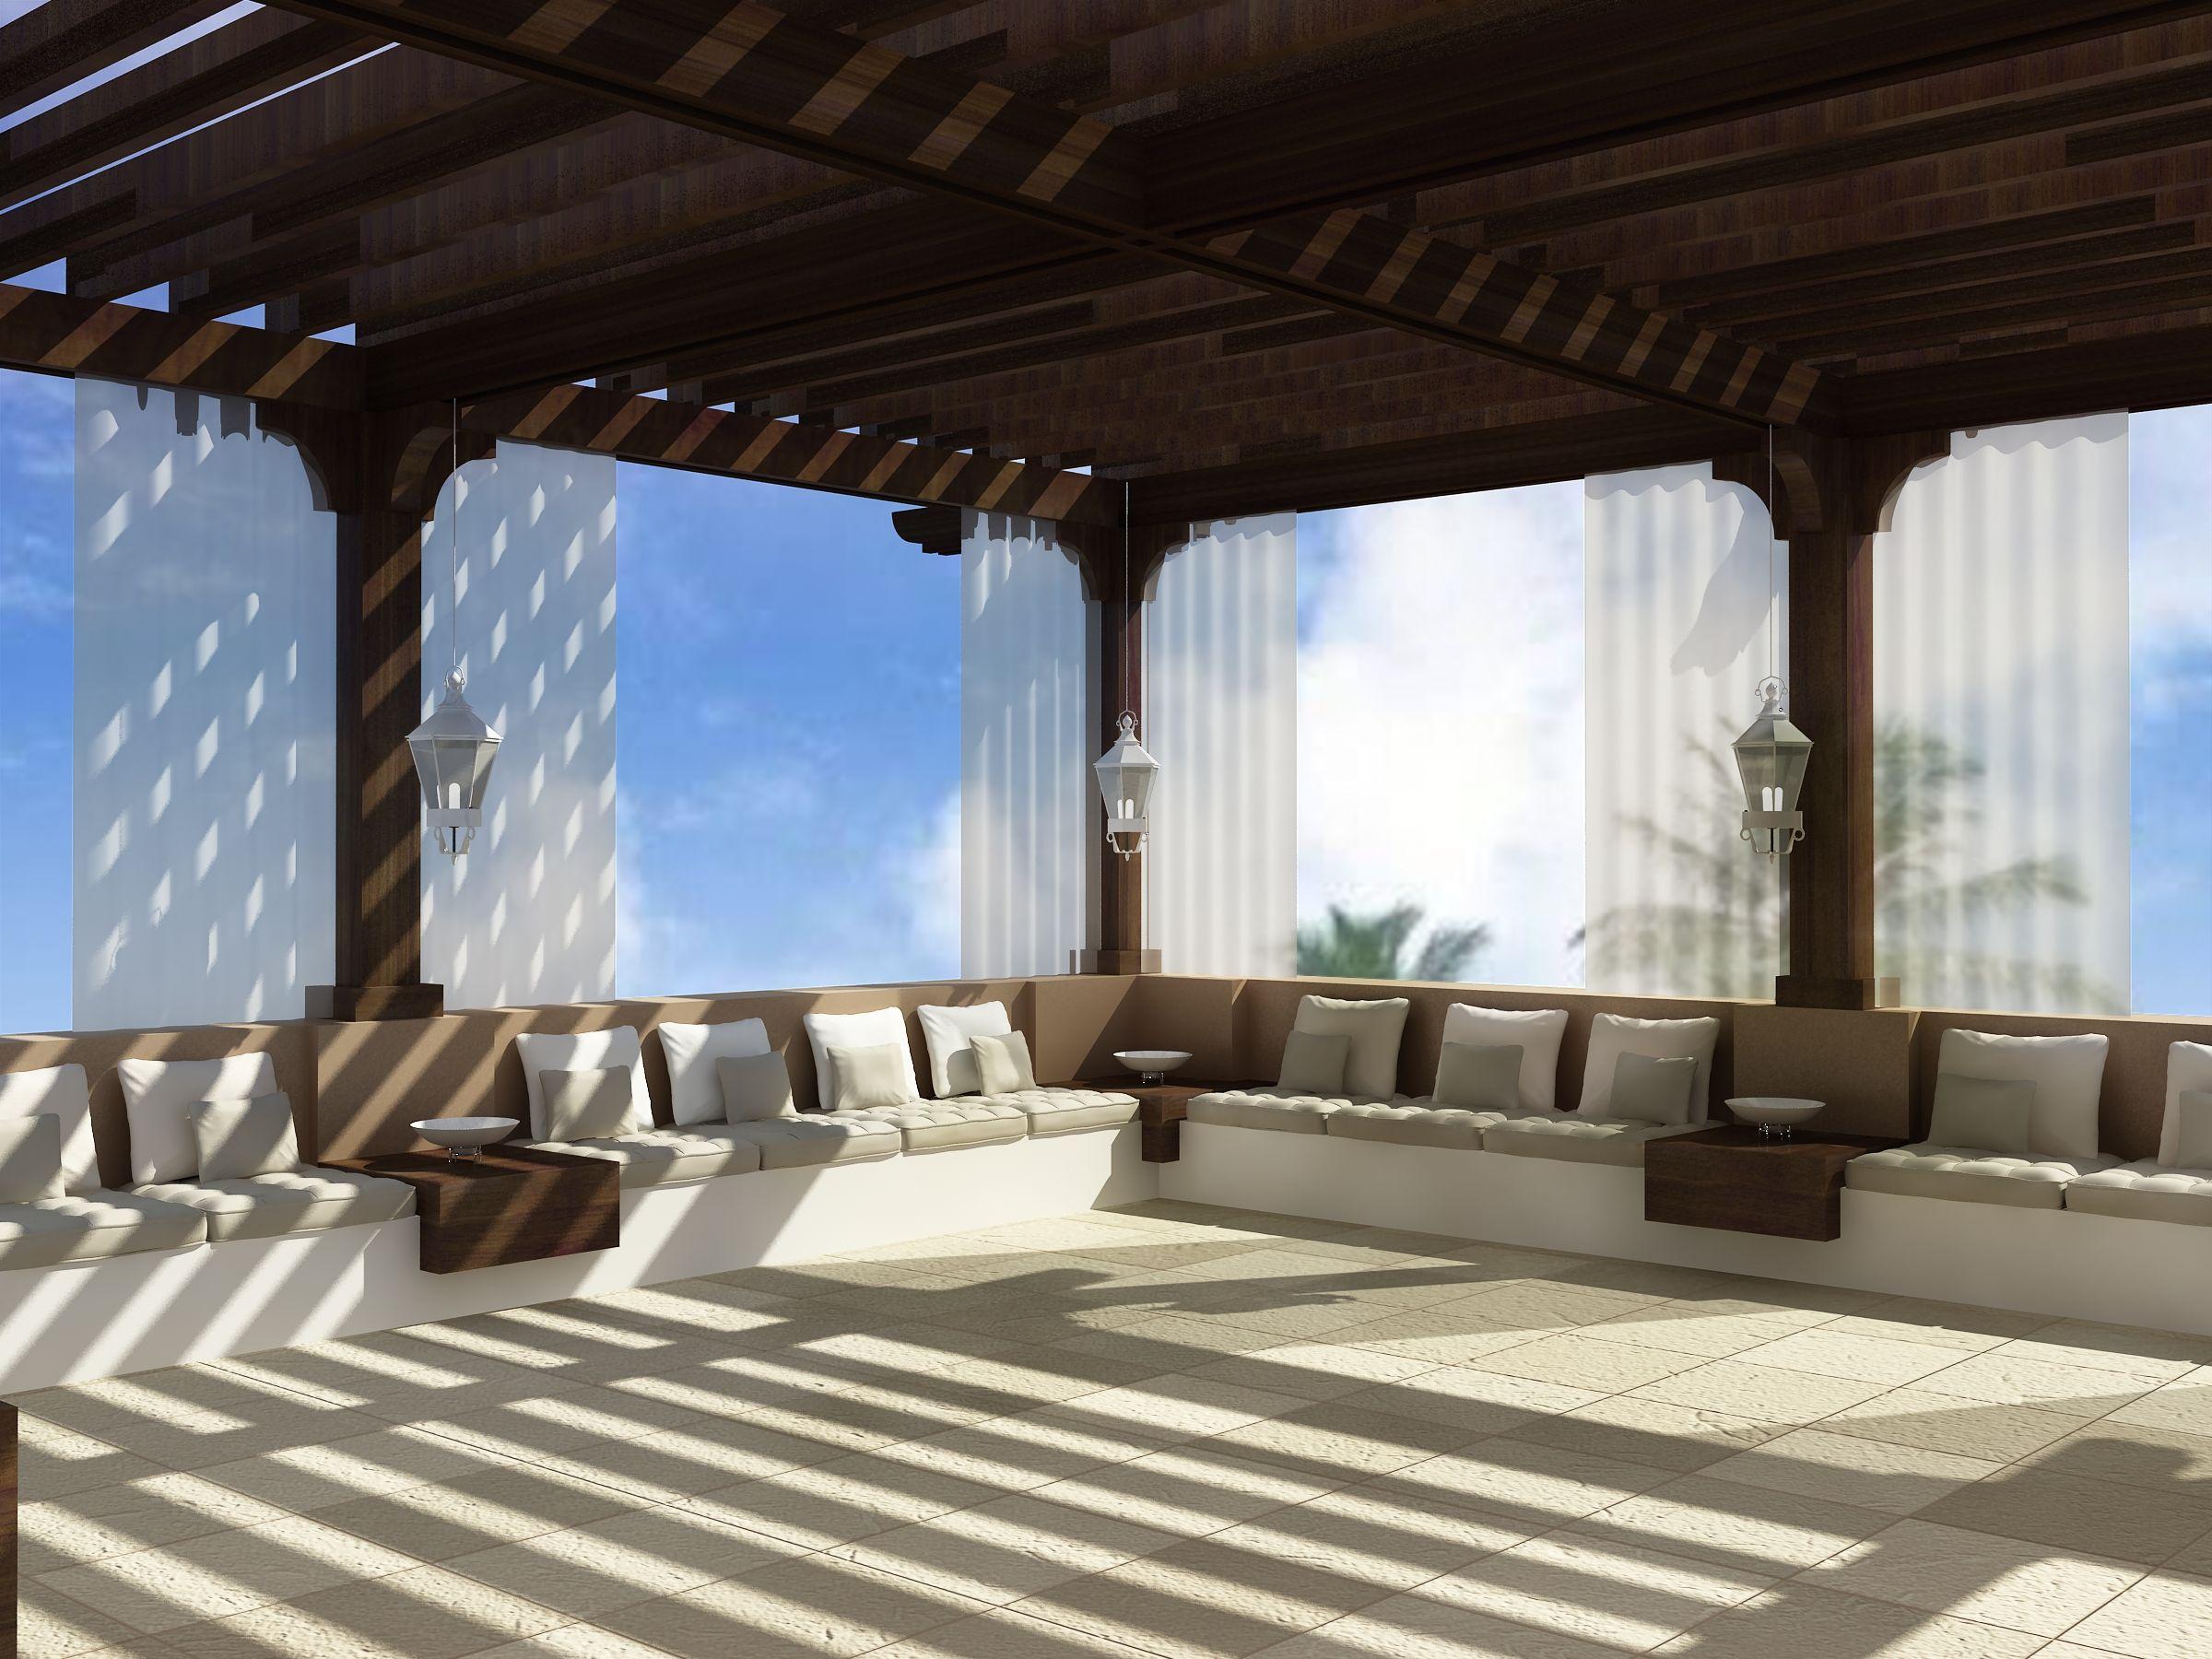 Arabian Roof Majlis Design Arabian Decor Architect